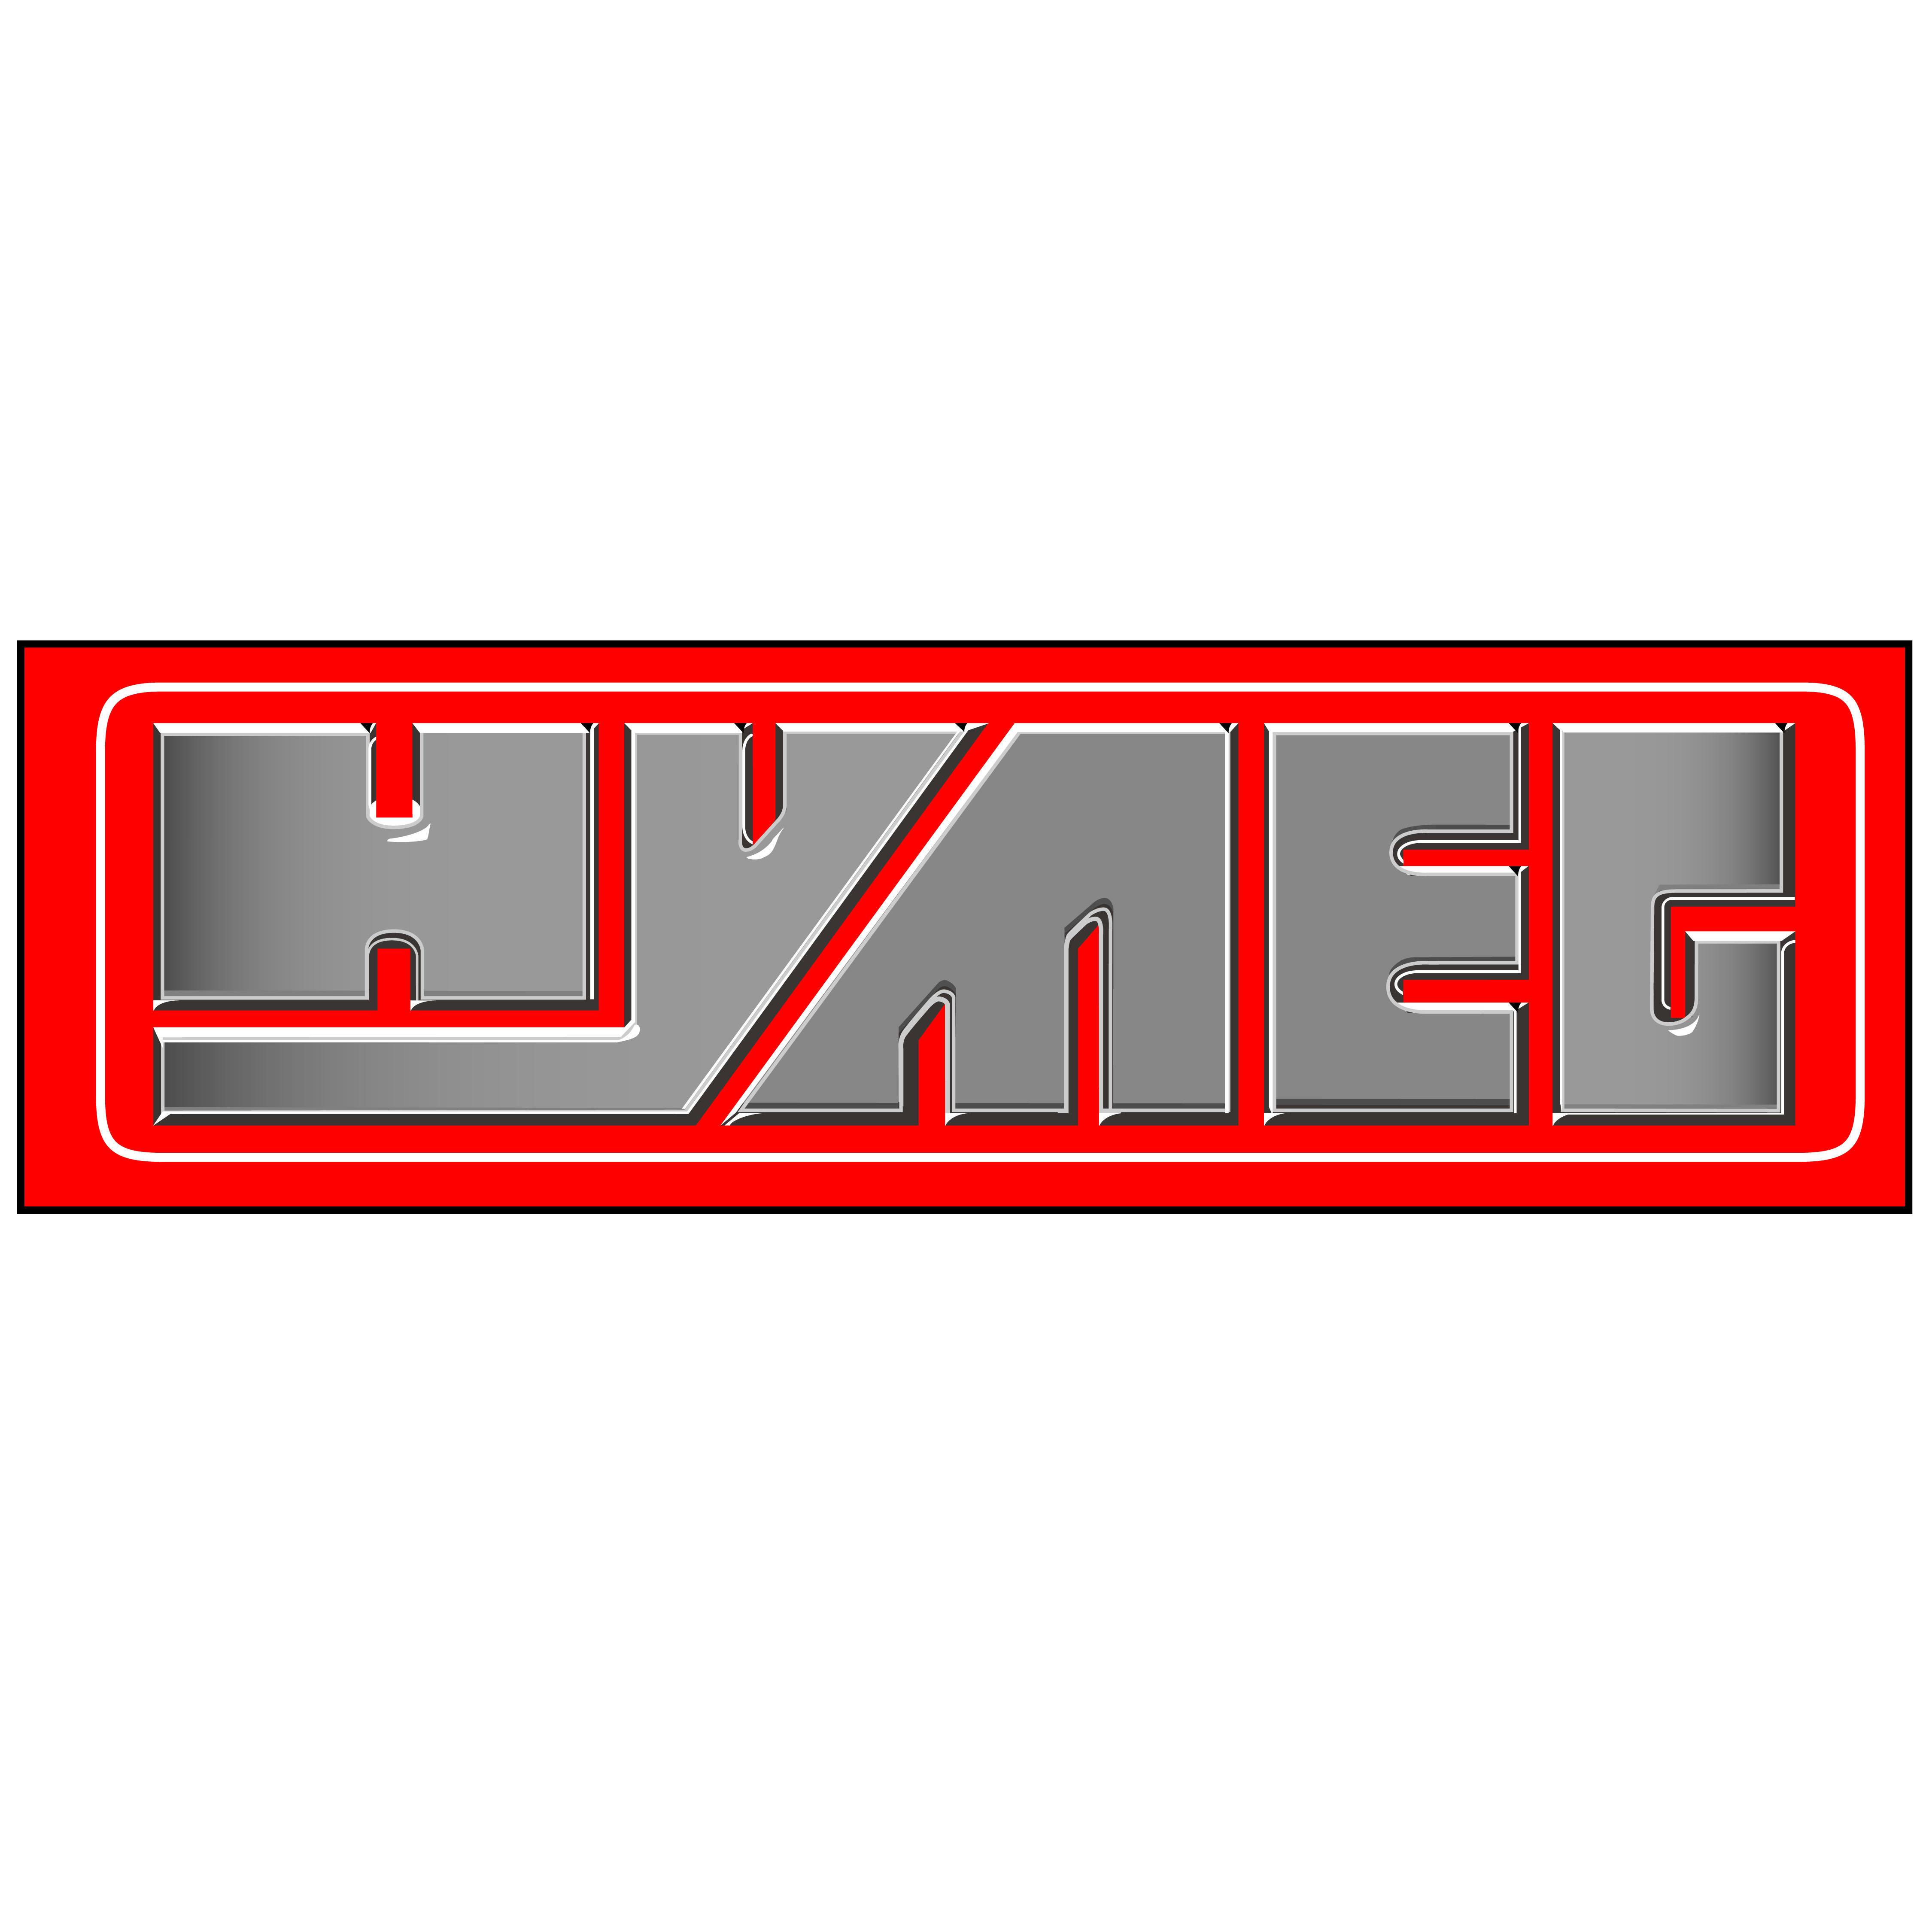 Hymeg Corporation